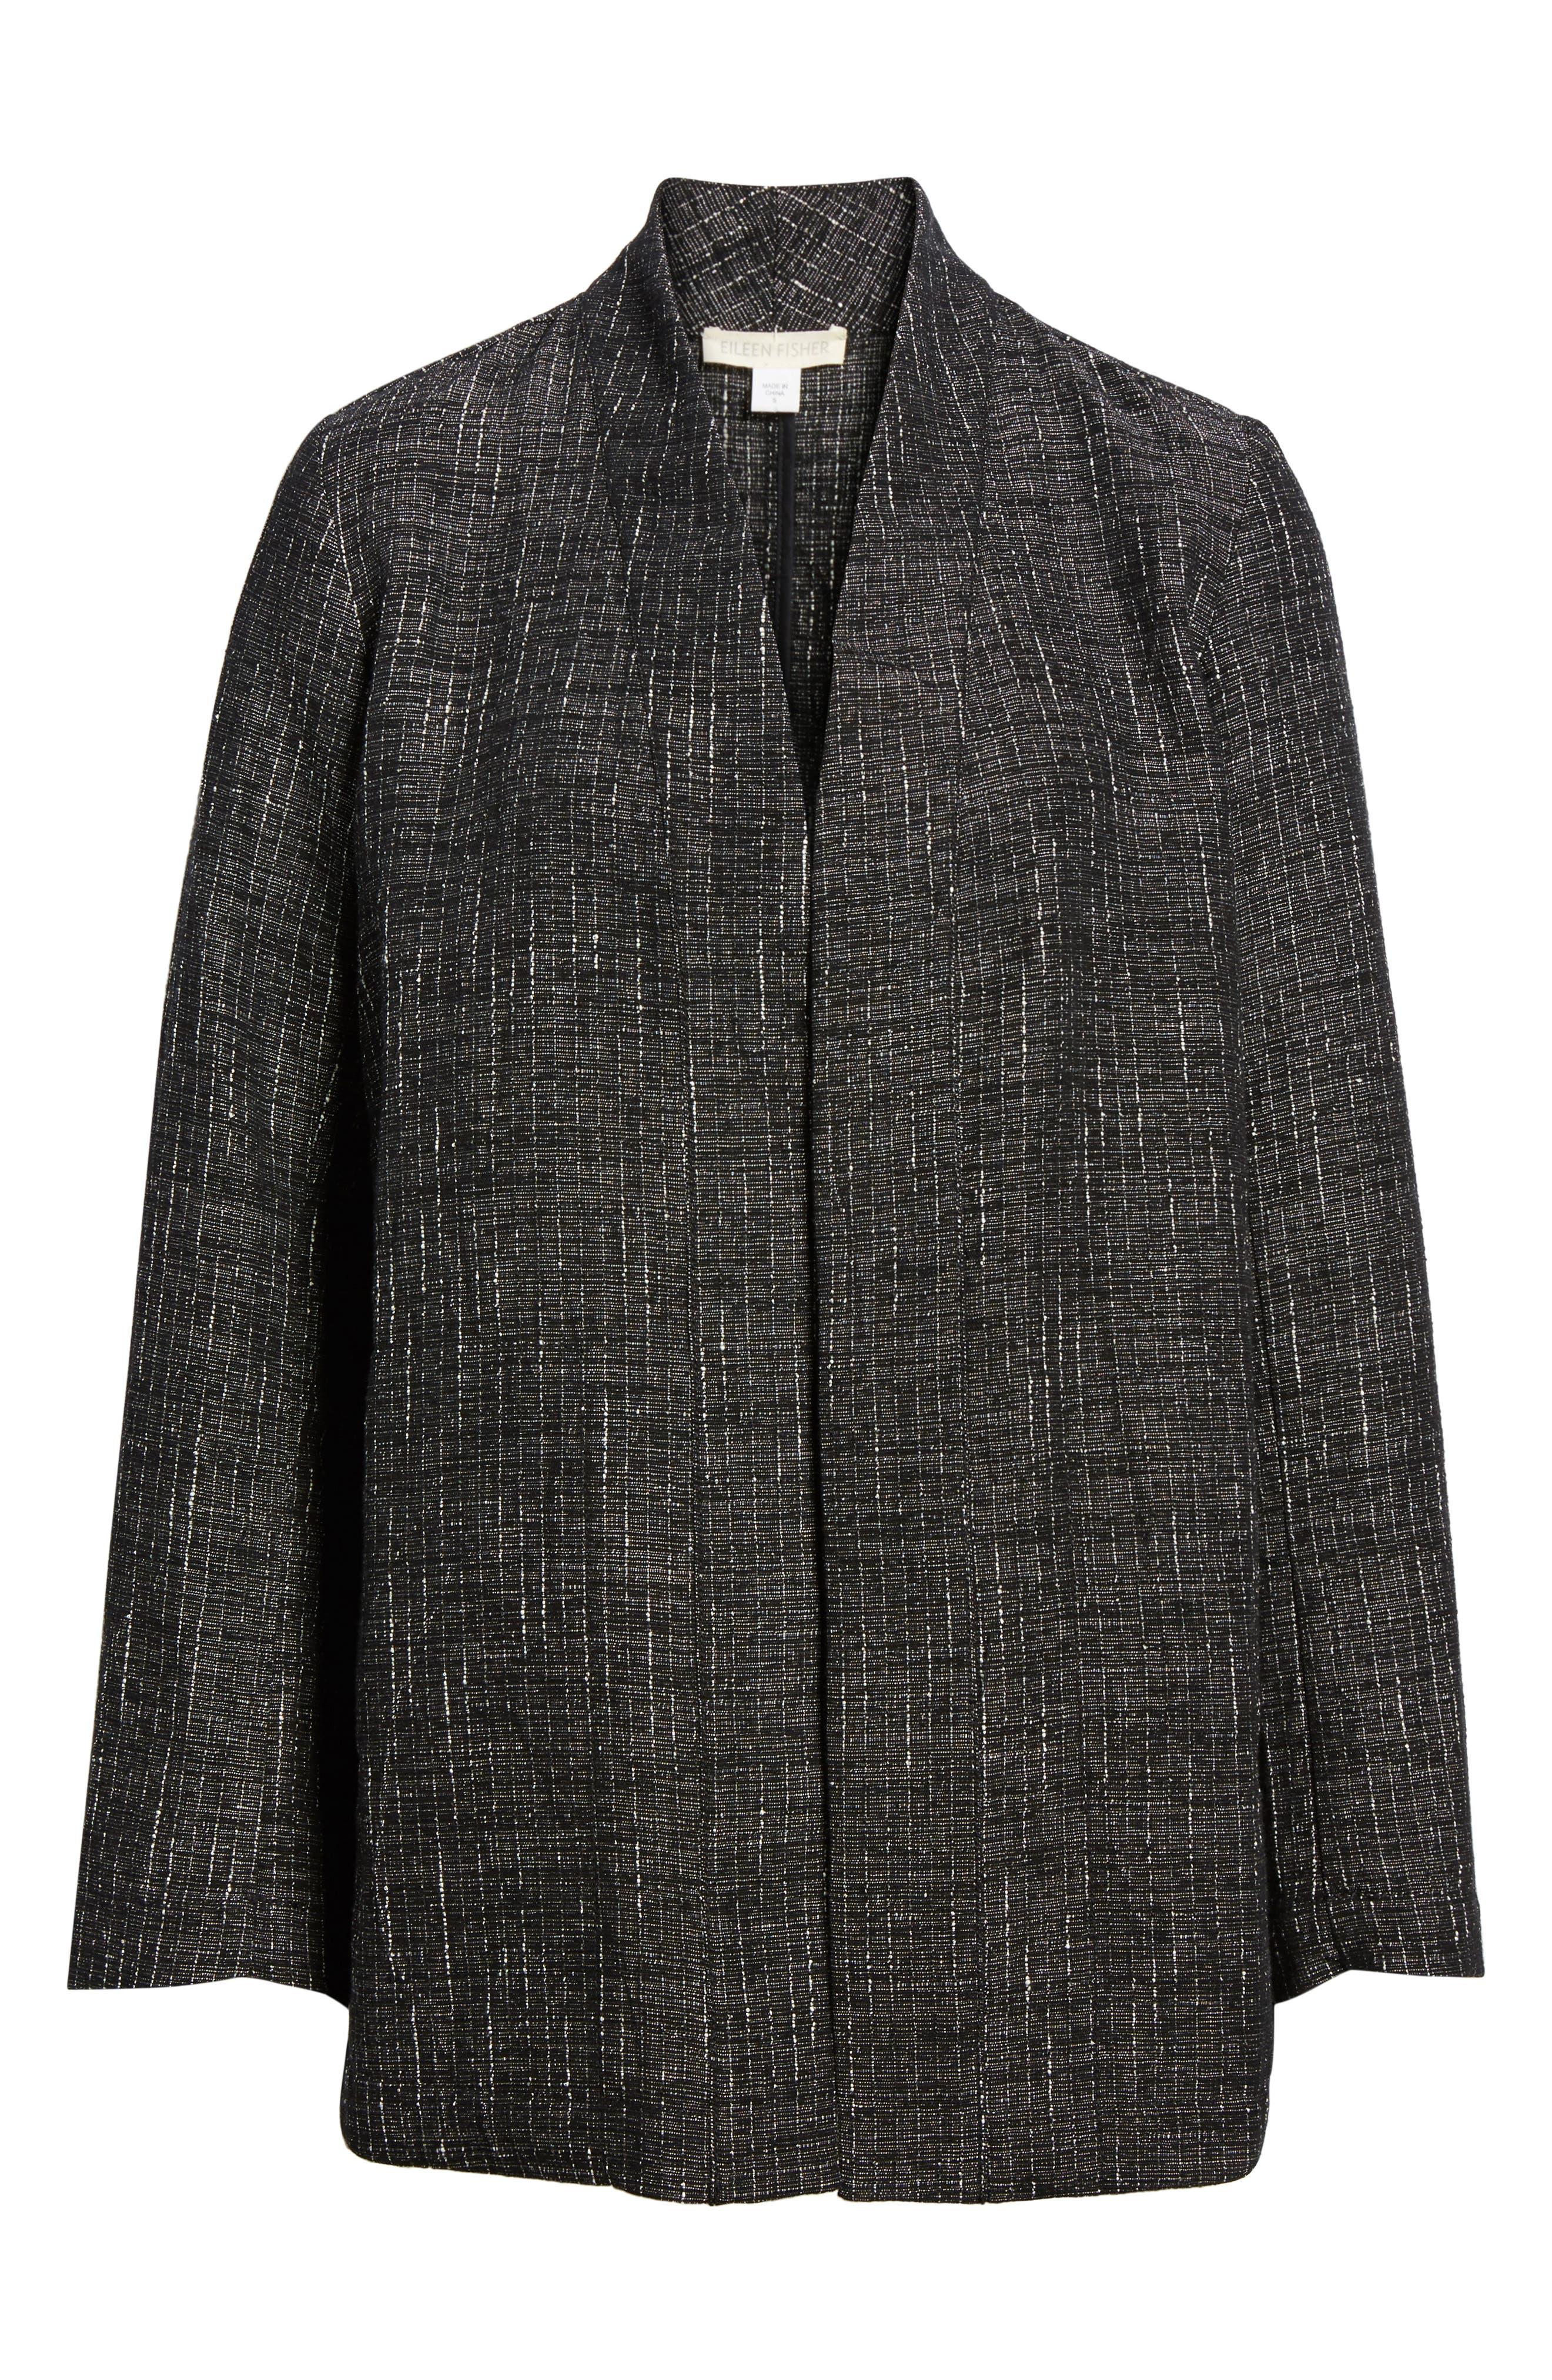 Stand Collar Kimono Jacket,                             Alternate thumbnail 6, color,                             Black